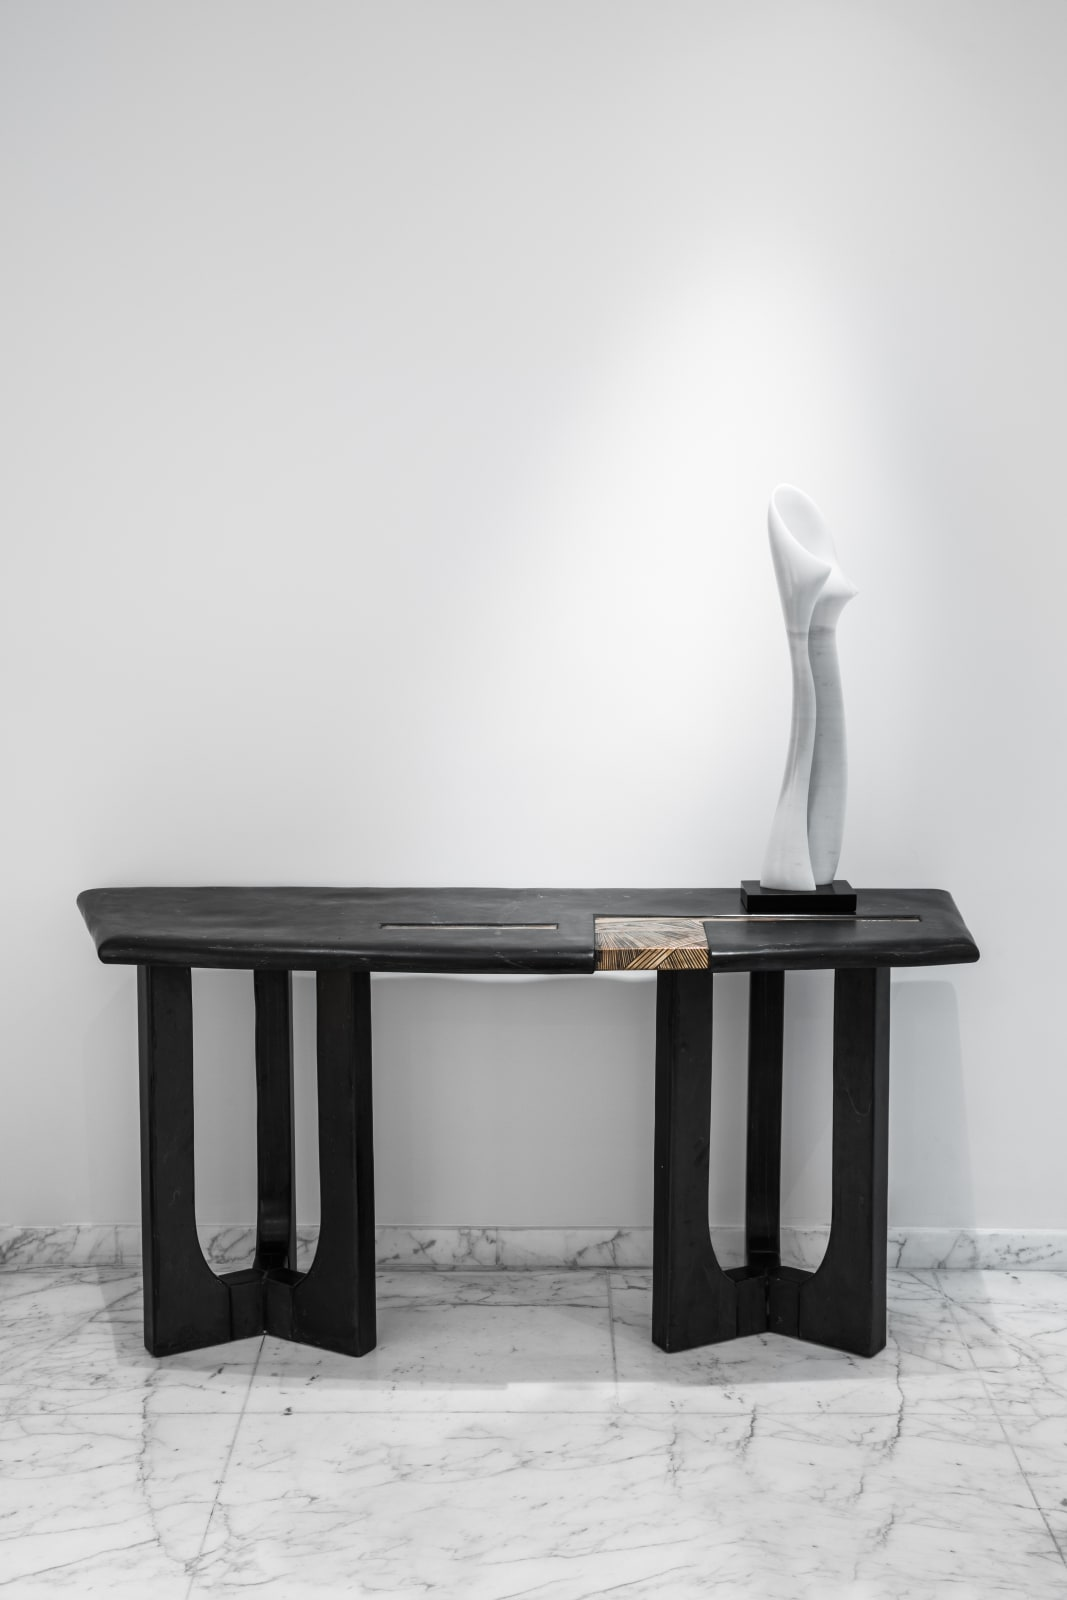 Console, Emmanuel Jonckers Effeuillage Sculpture, Florian Cabrera